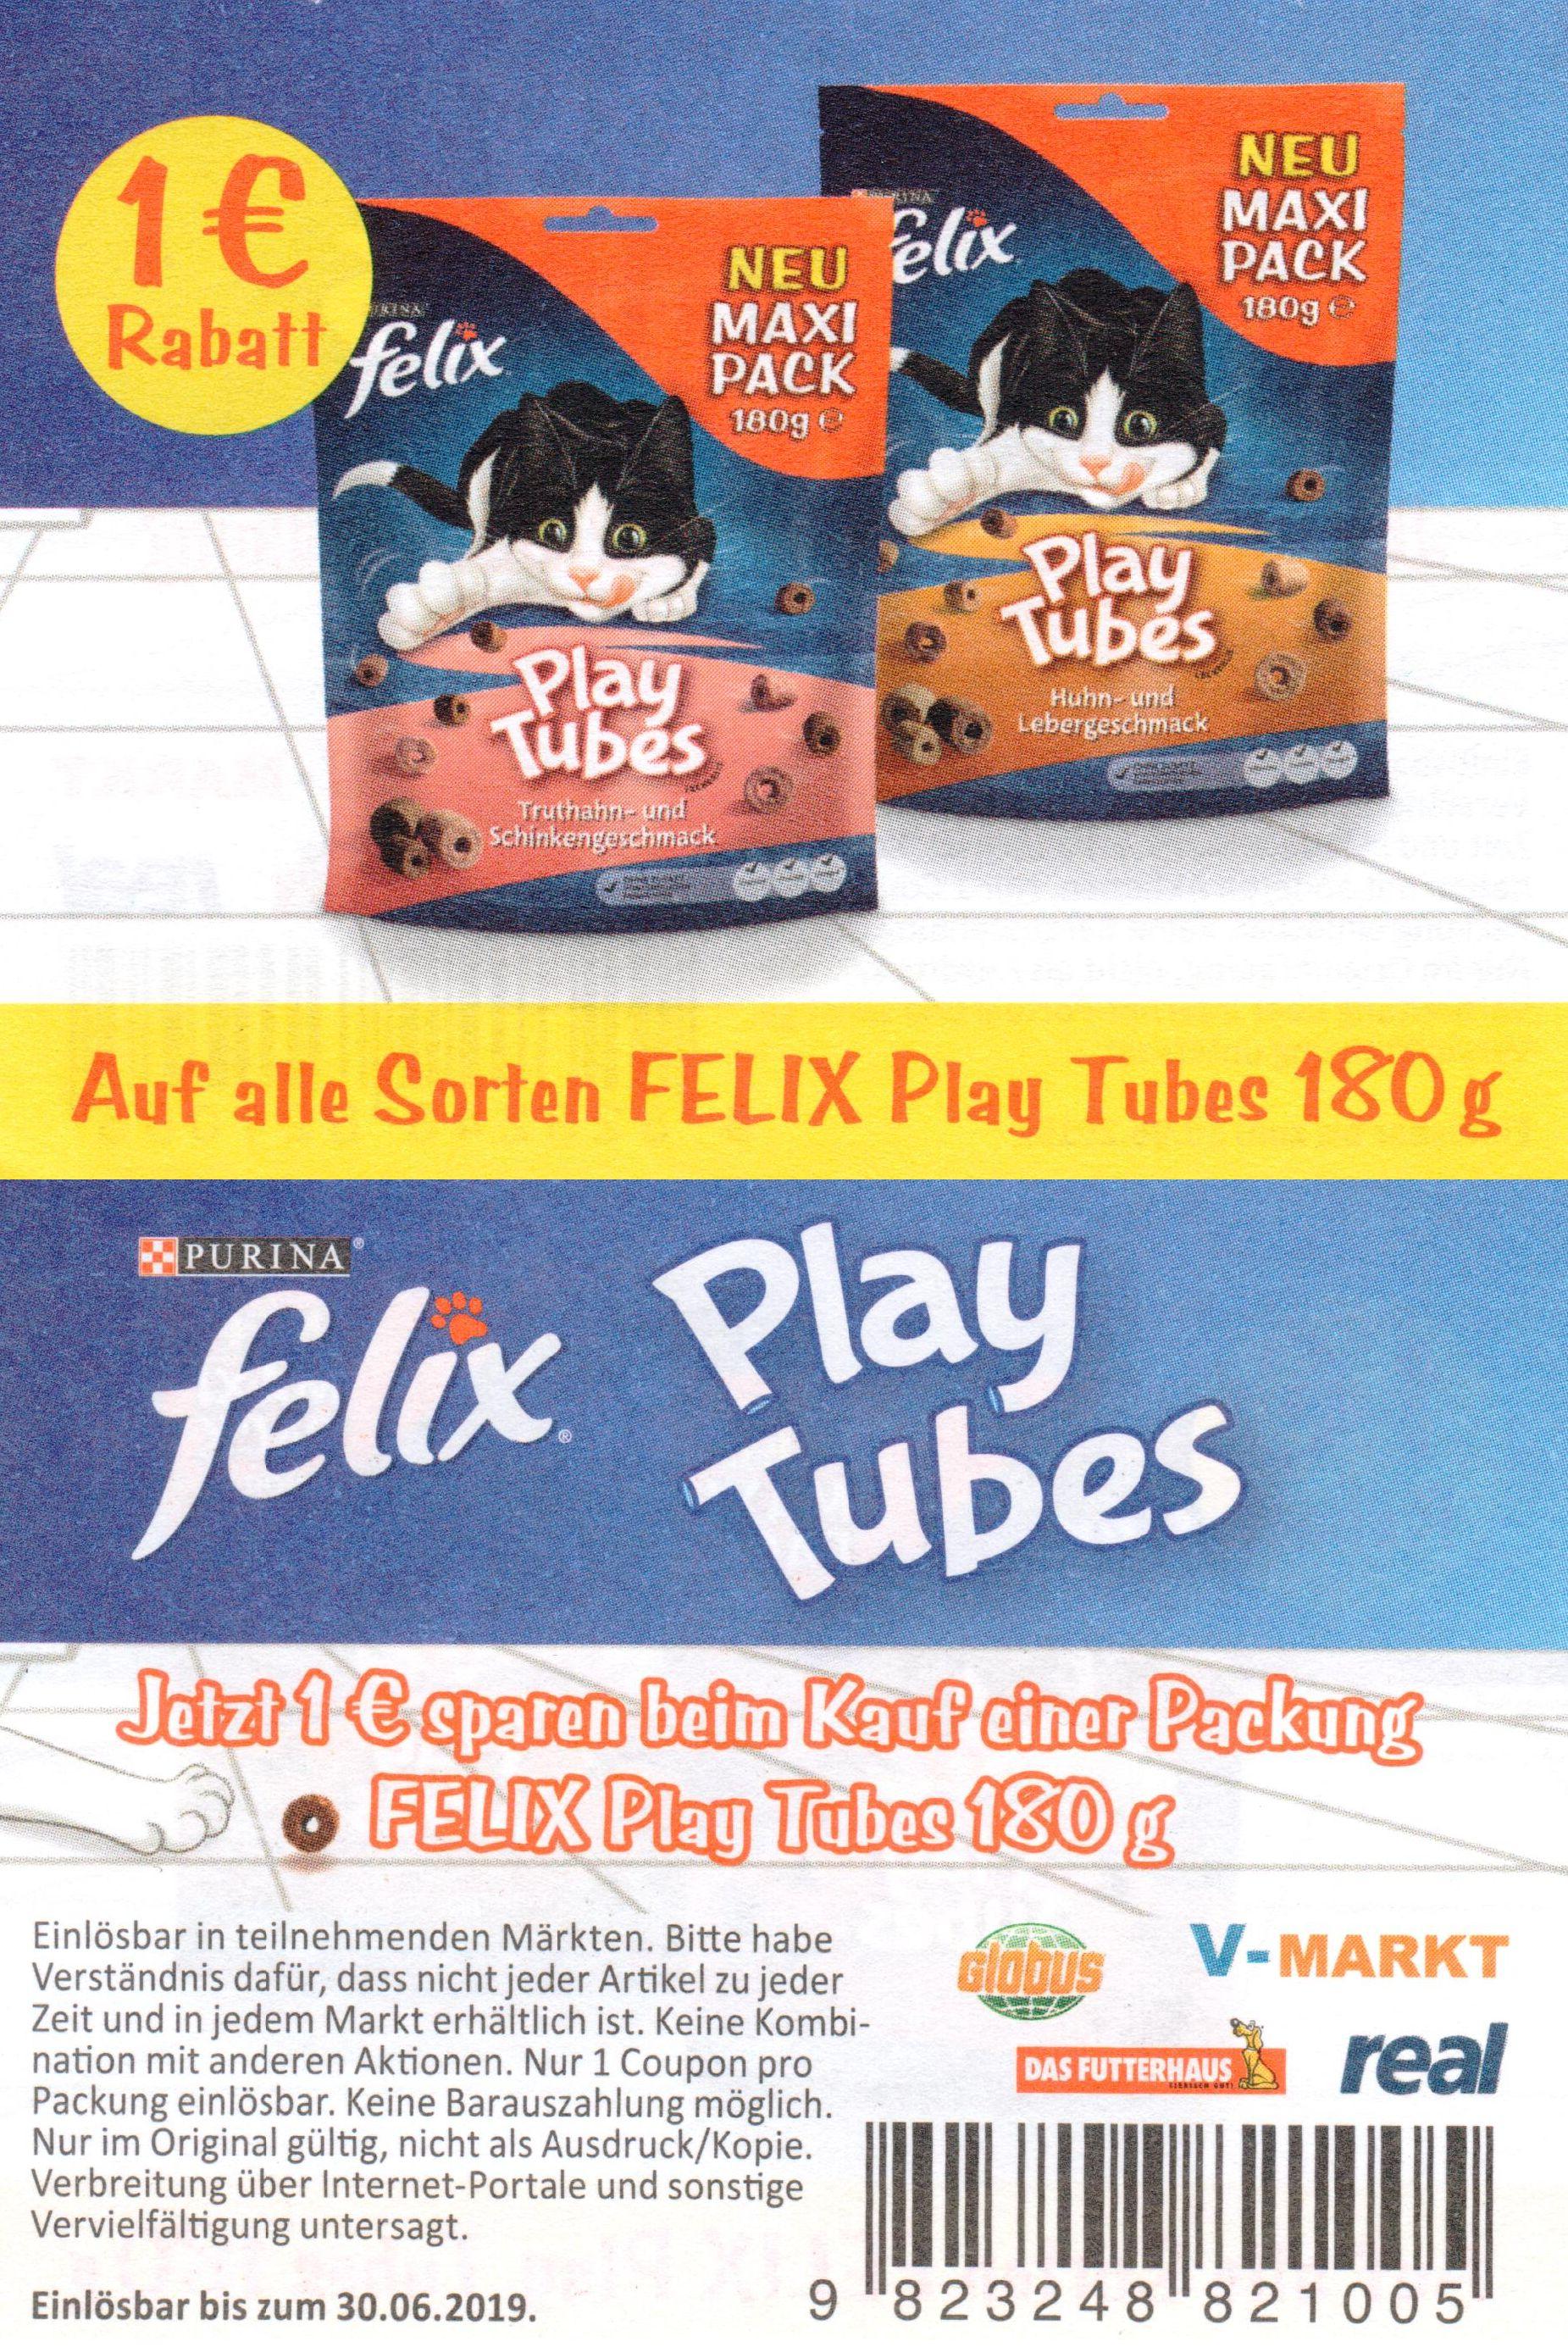 1,00€ Sofort-Rabatt Coupon für Purina Felix Play Tubes bis 30.06.2019